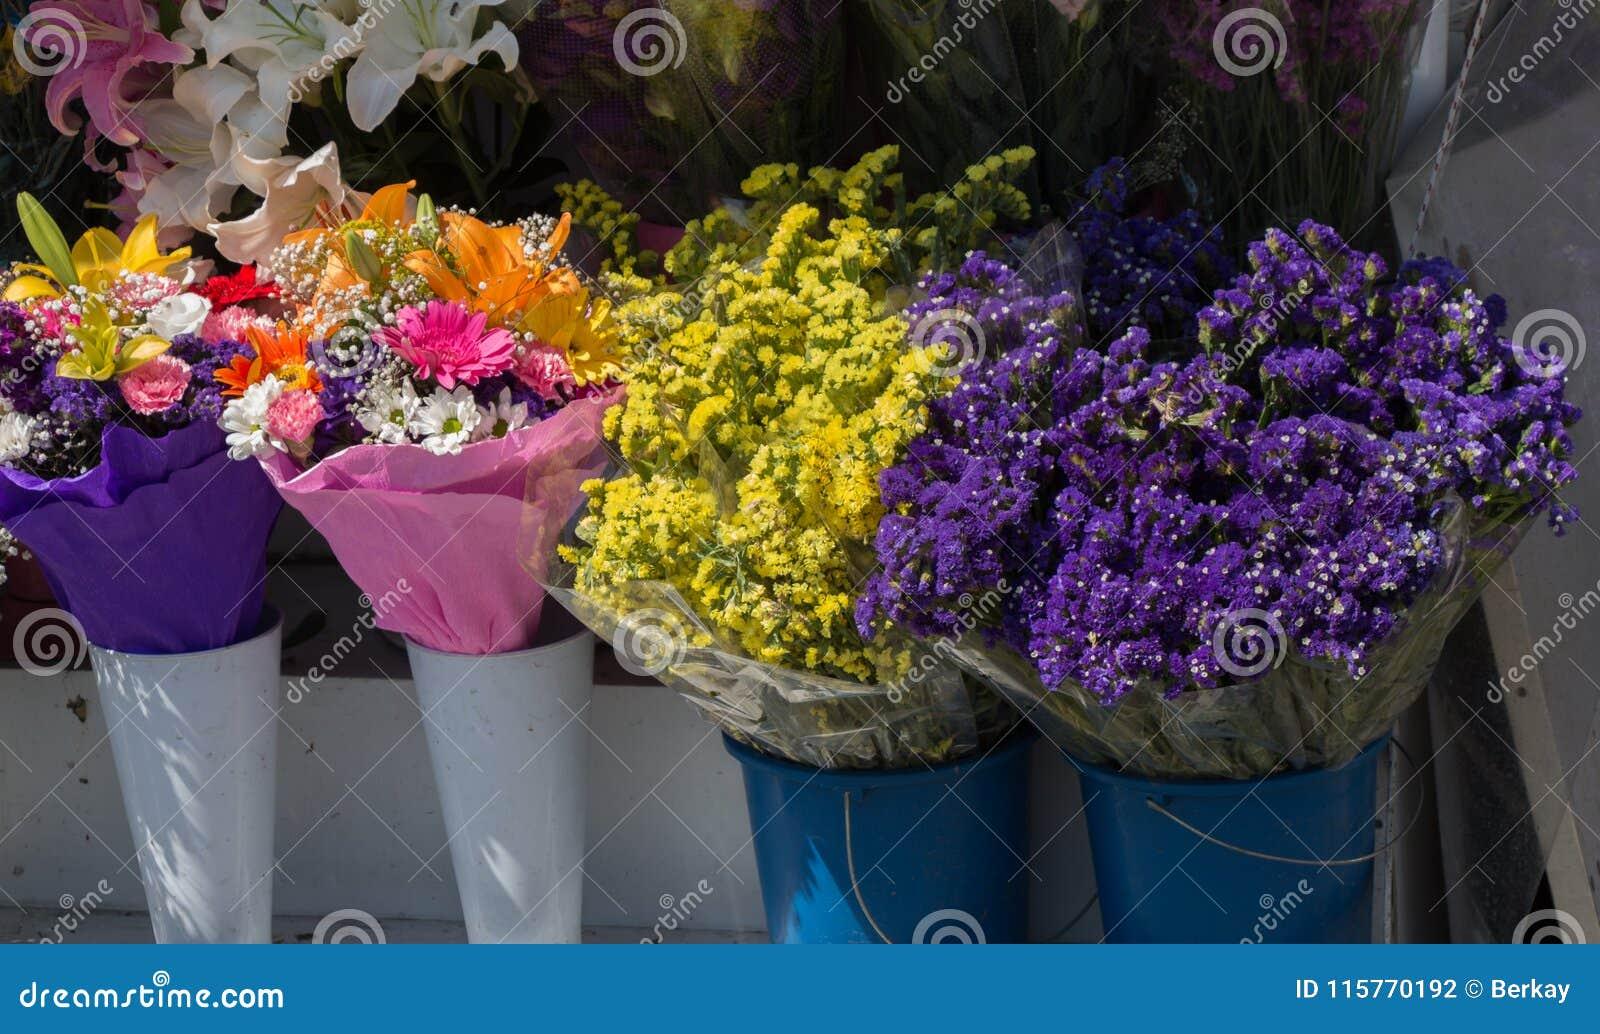 Beautiful flowers of various types stock photo image of field download beautiful flowers of various types stock photo image of field environment 115770192 izmirmasajfo